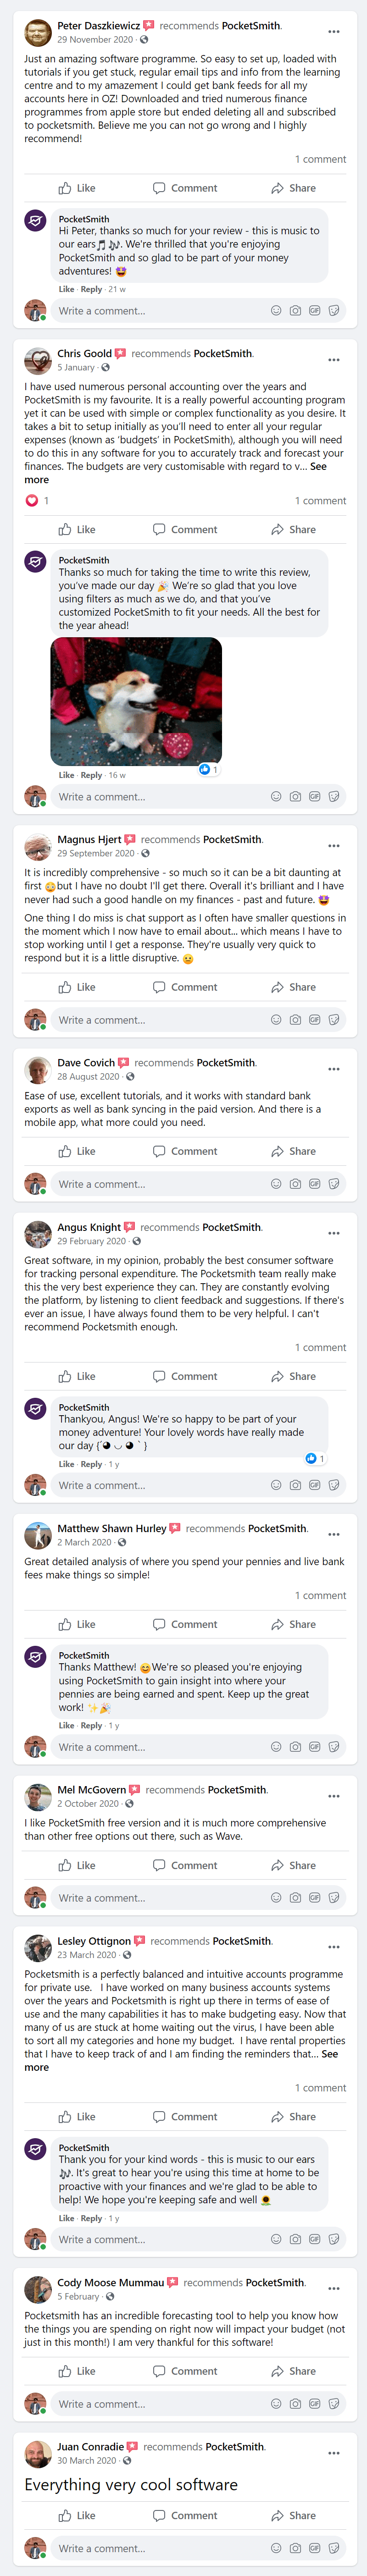 PocketSmith-Facebook